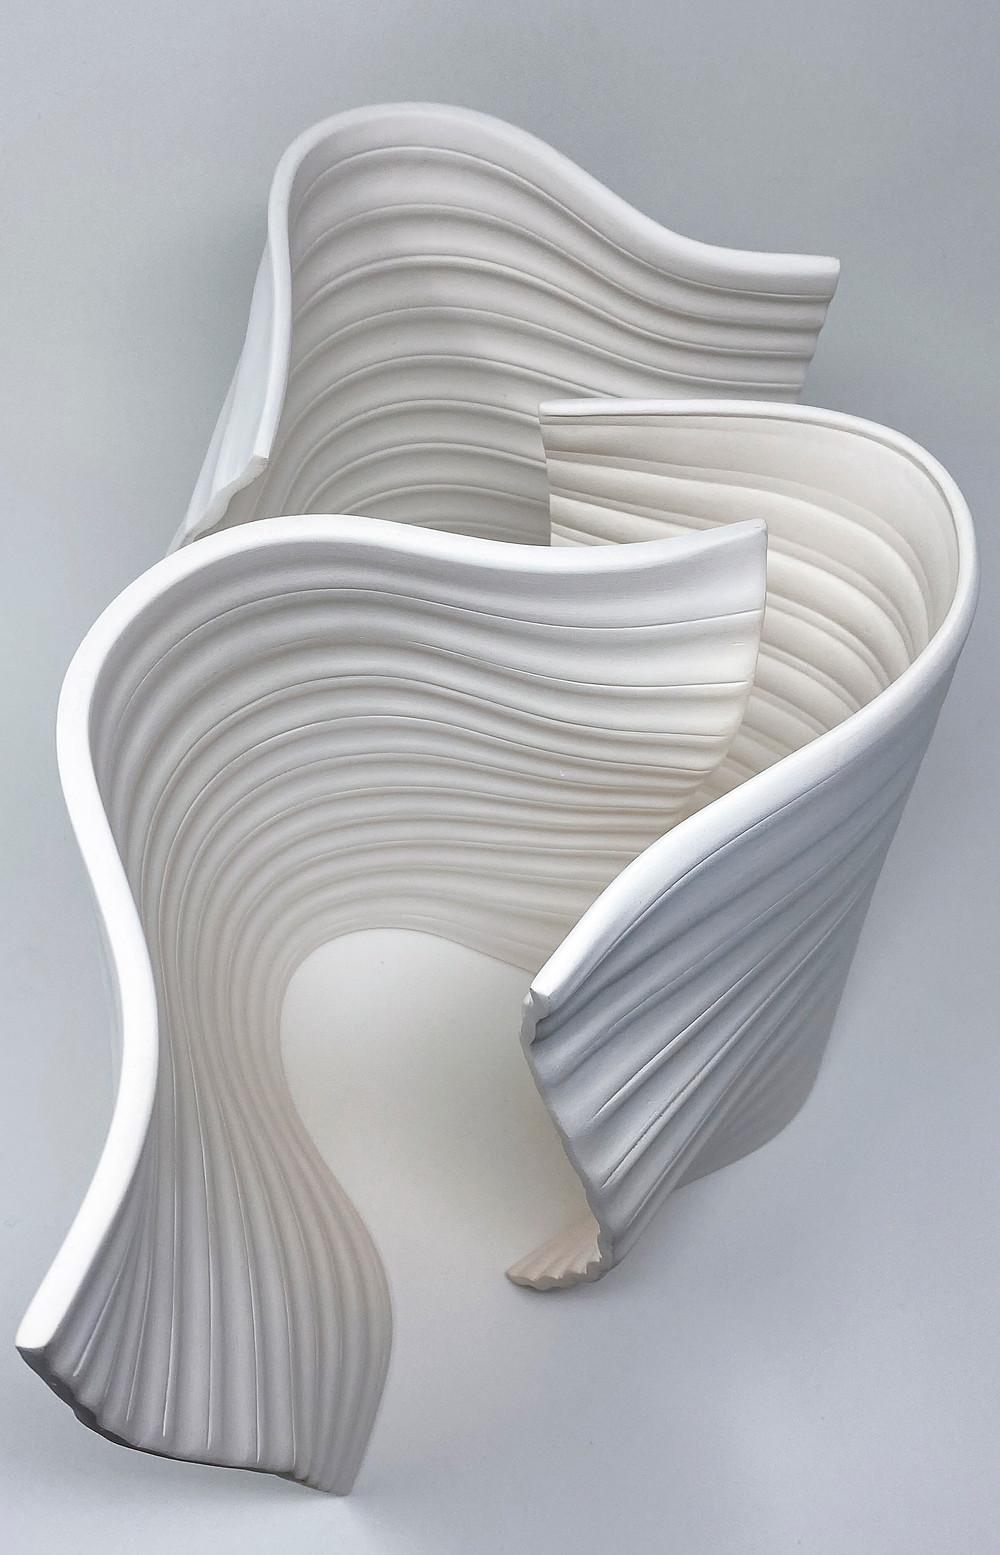 Release' III (2020), porcelain, glaze